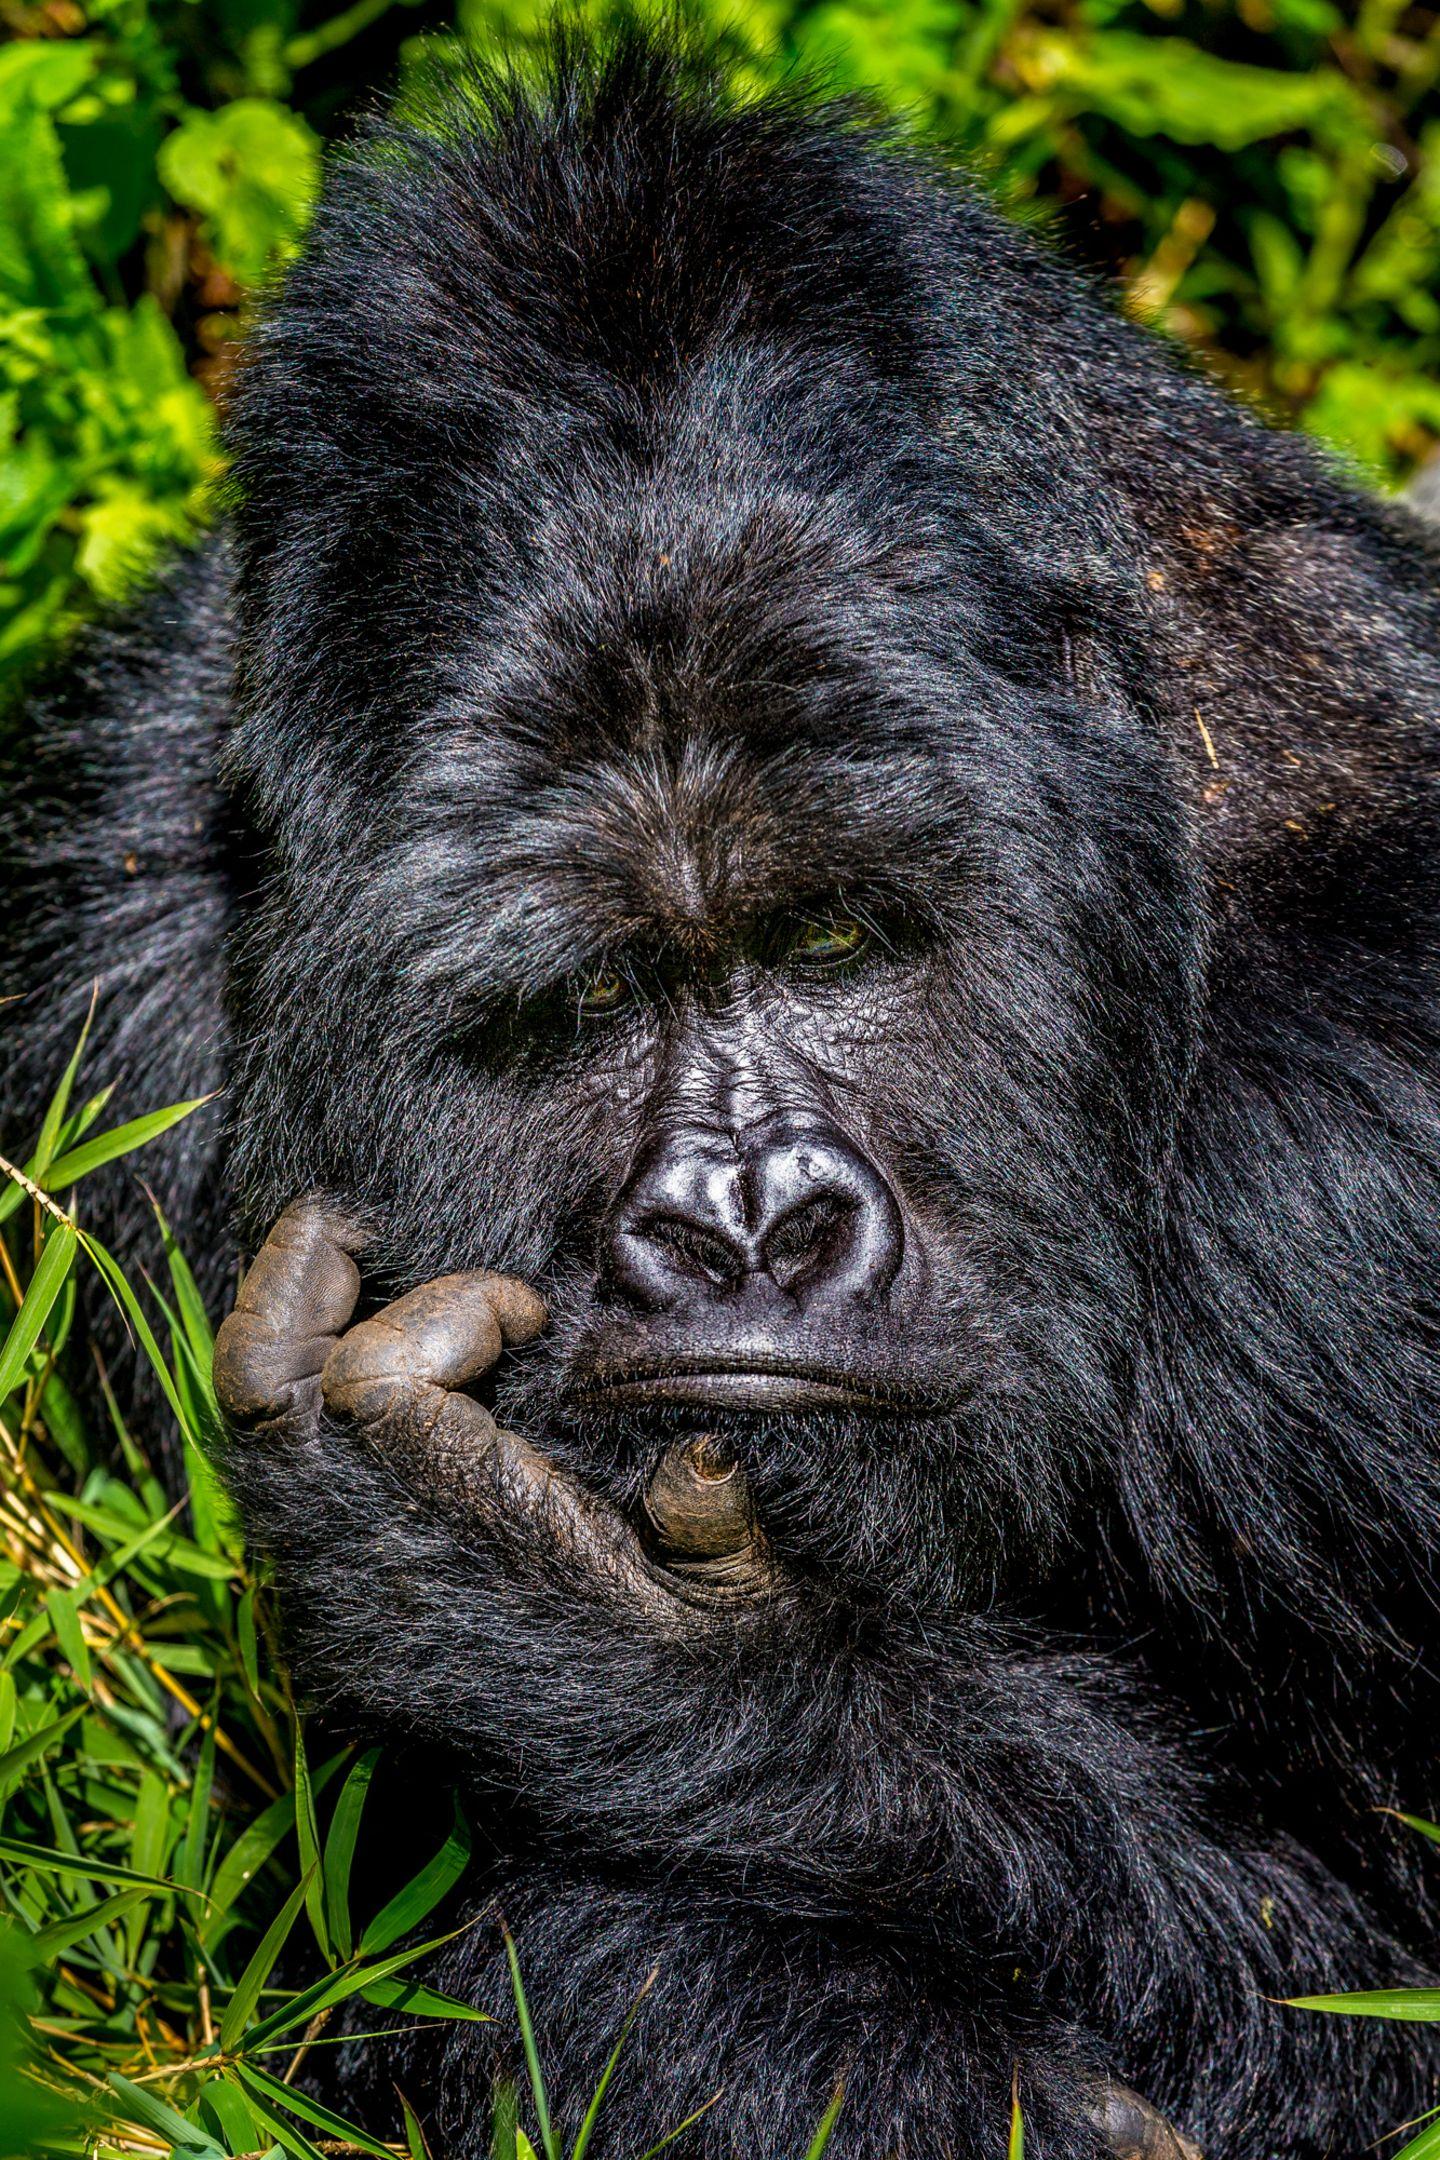 Comedy Wildlife Awards 2020: Gorilla